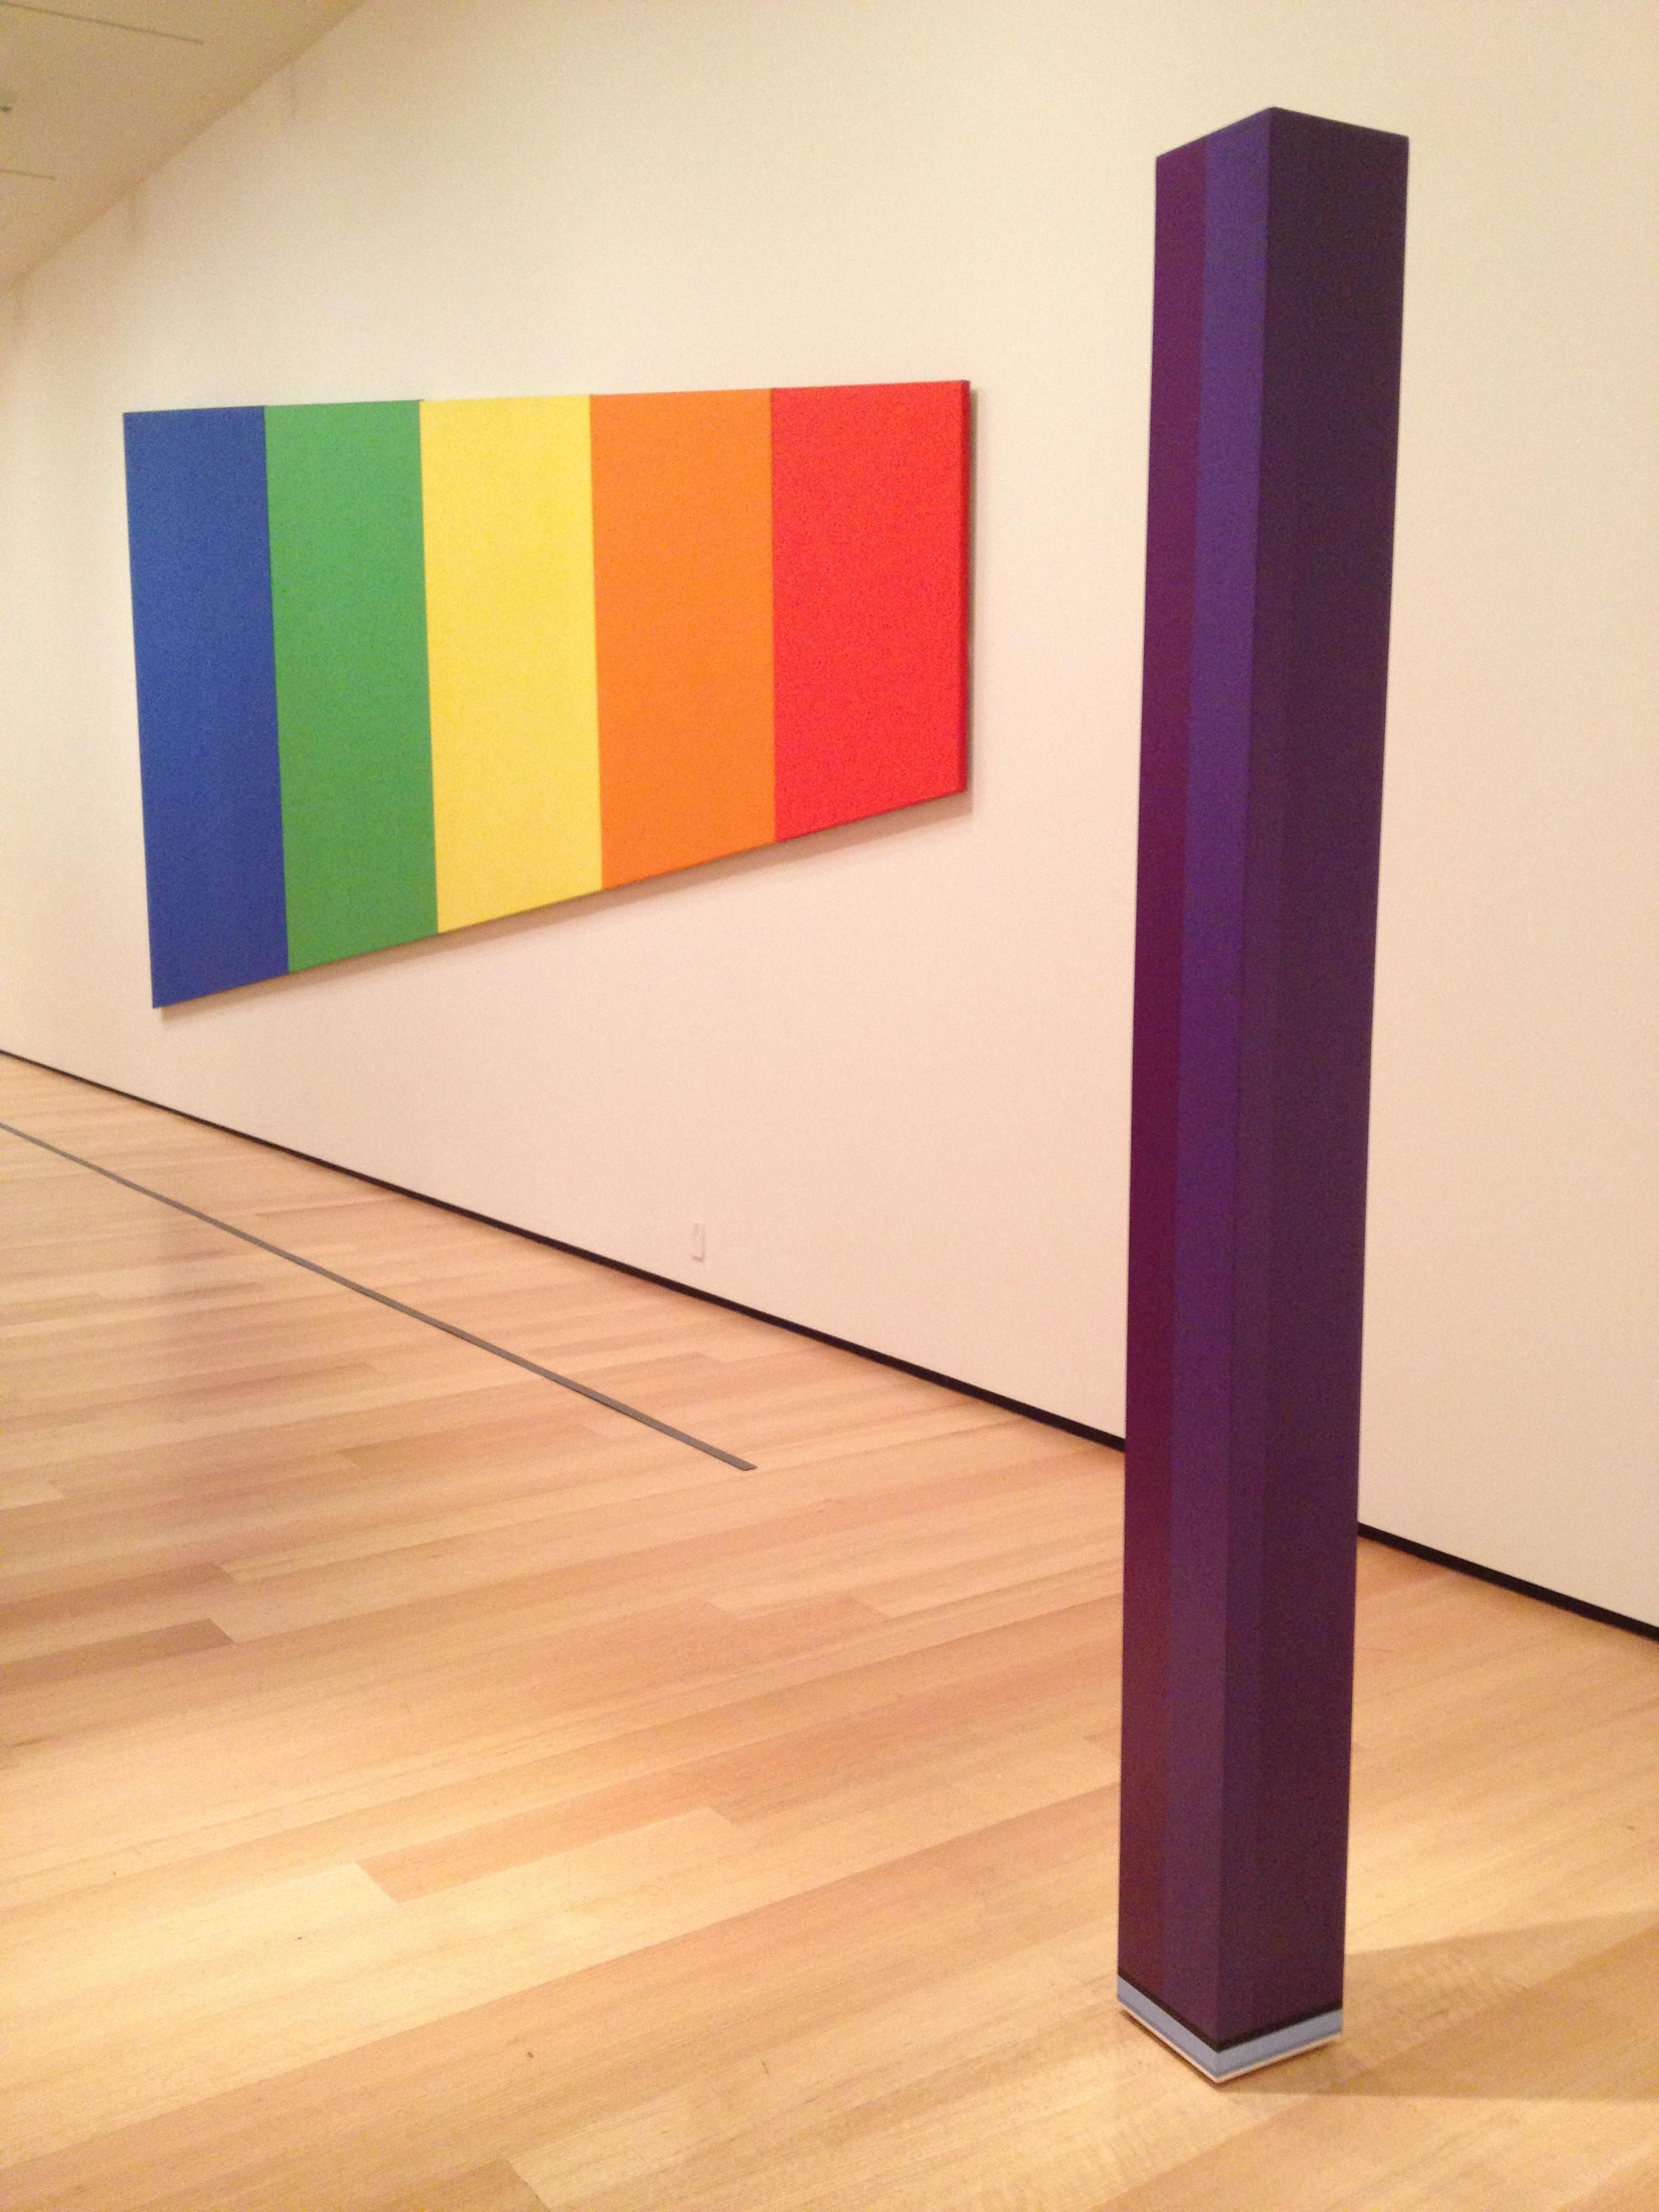 Ellsworth Kelly, Blue Green Yellow Orange Red (Blue panel), 1968